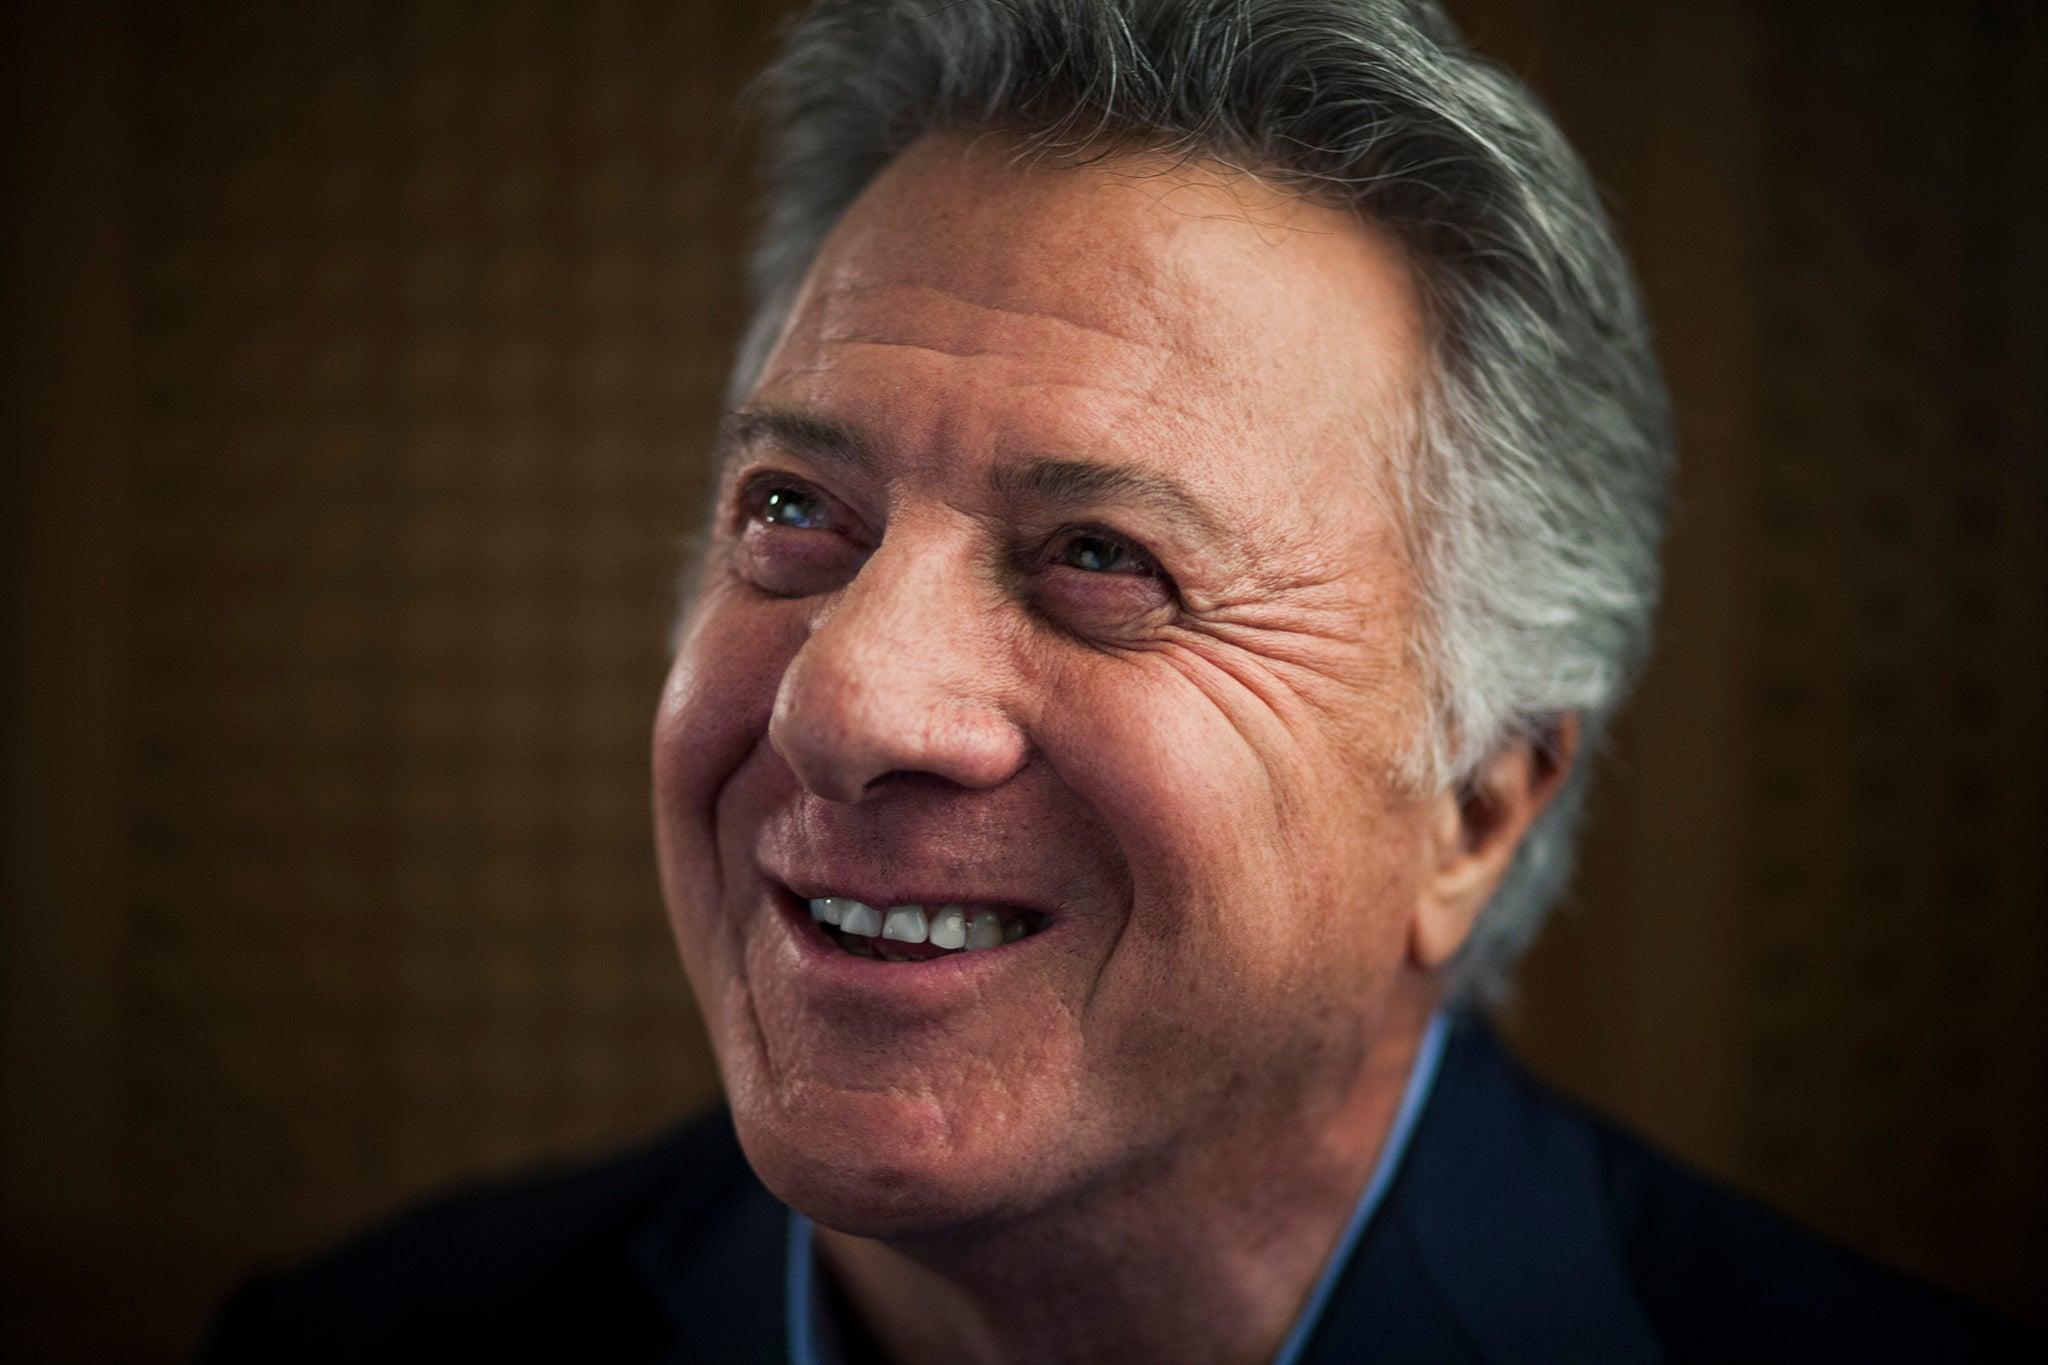 Dustin Hoffman Net Worth